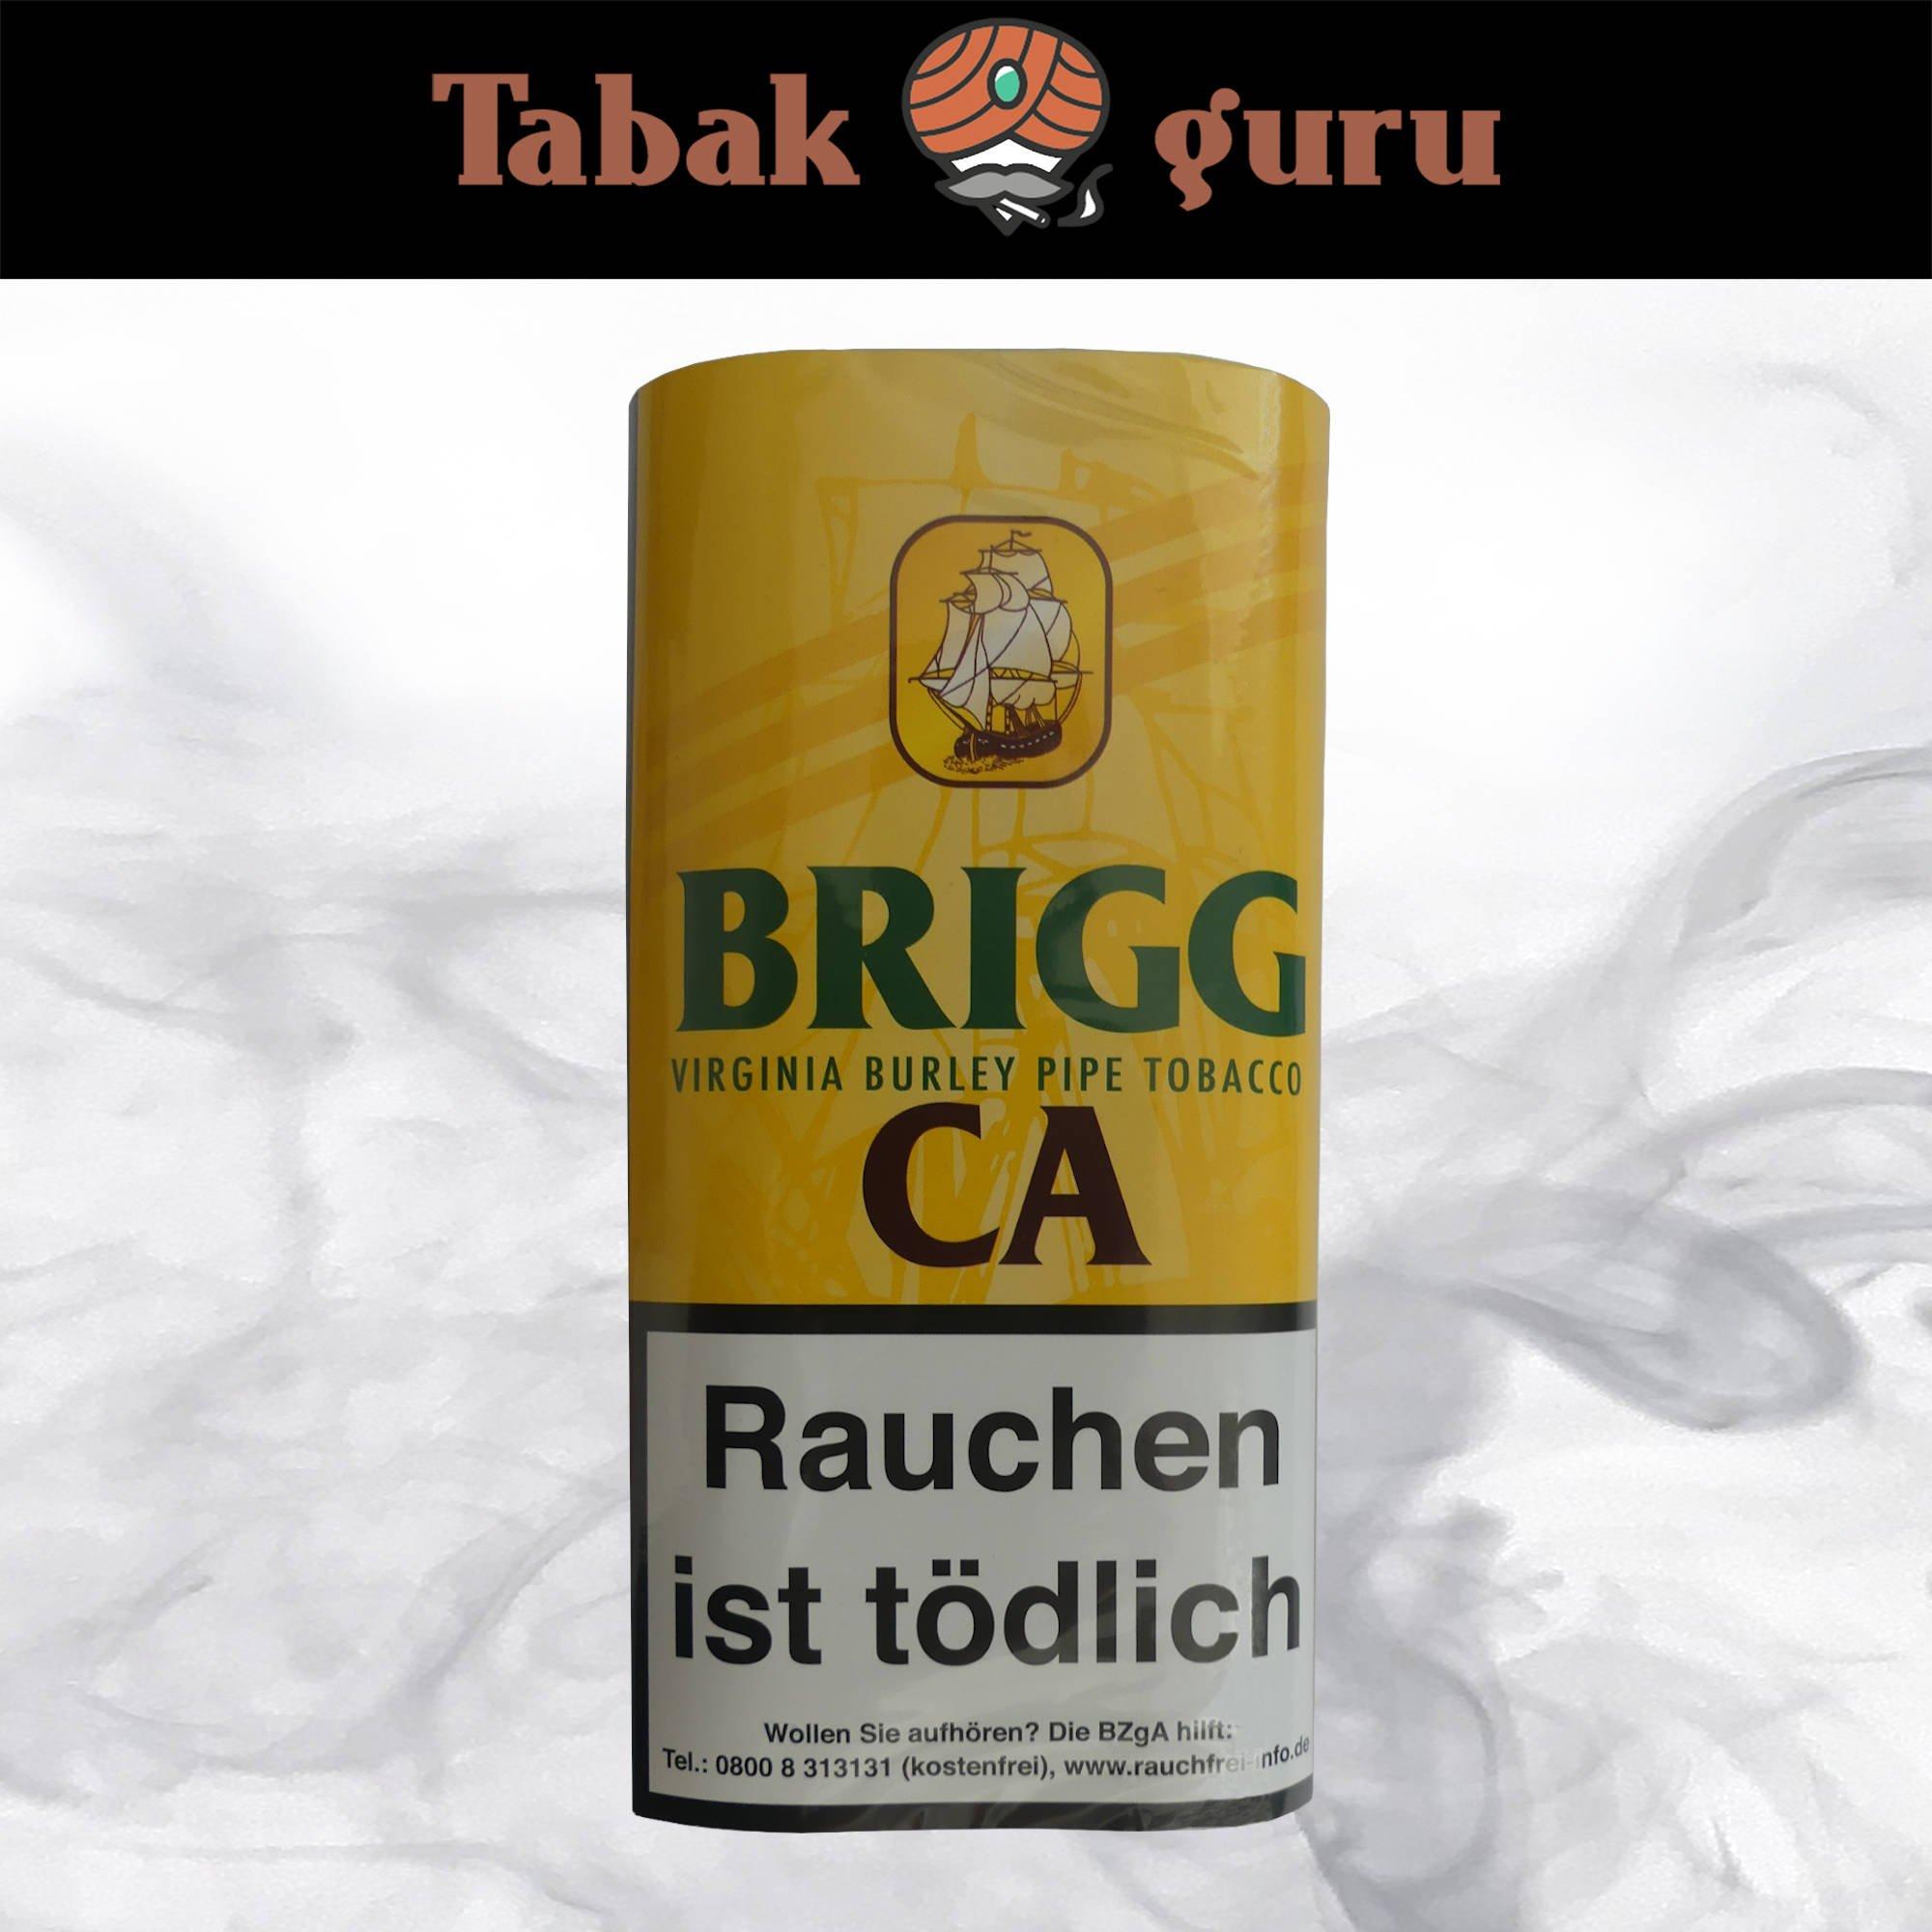 Brigg CA Pouch Pfeifentabak 40 g mit Coco Ananas Aroma